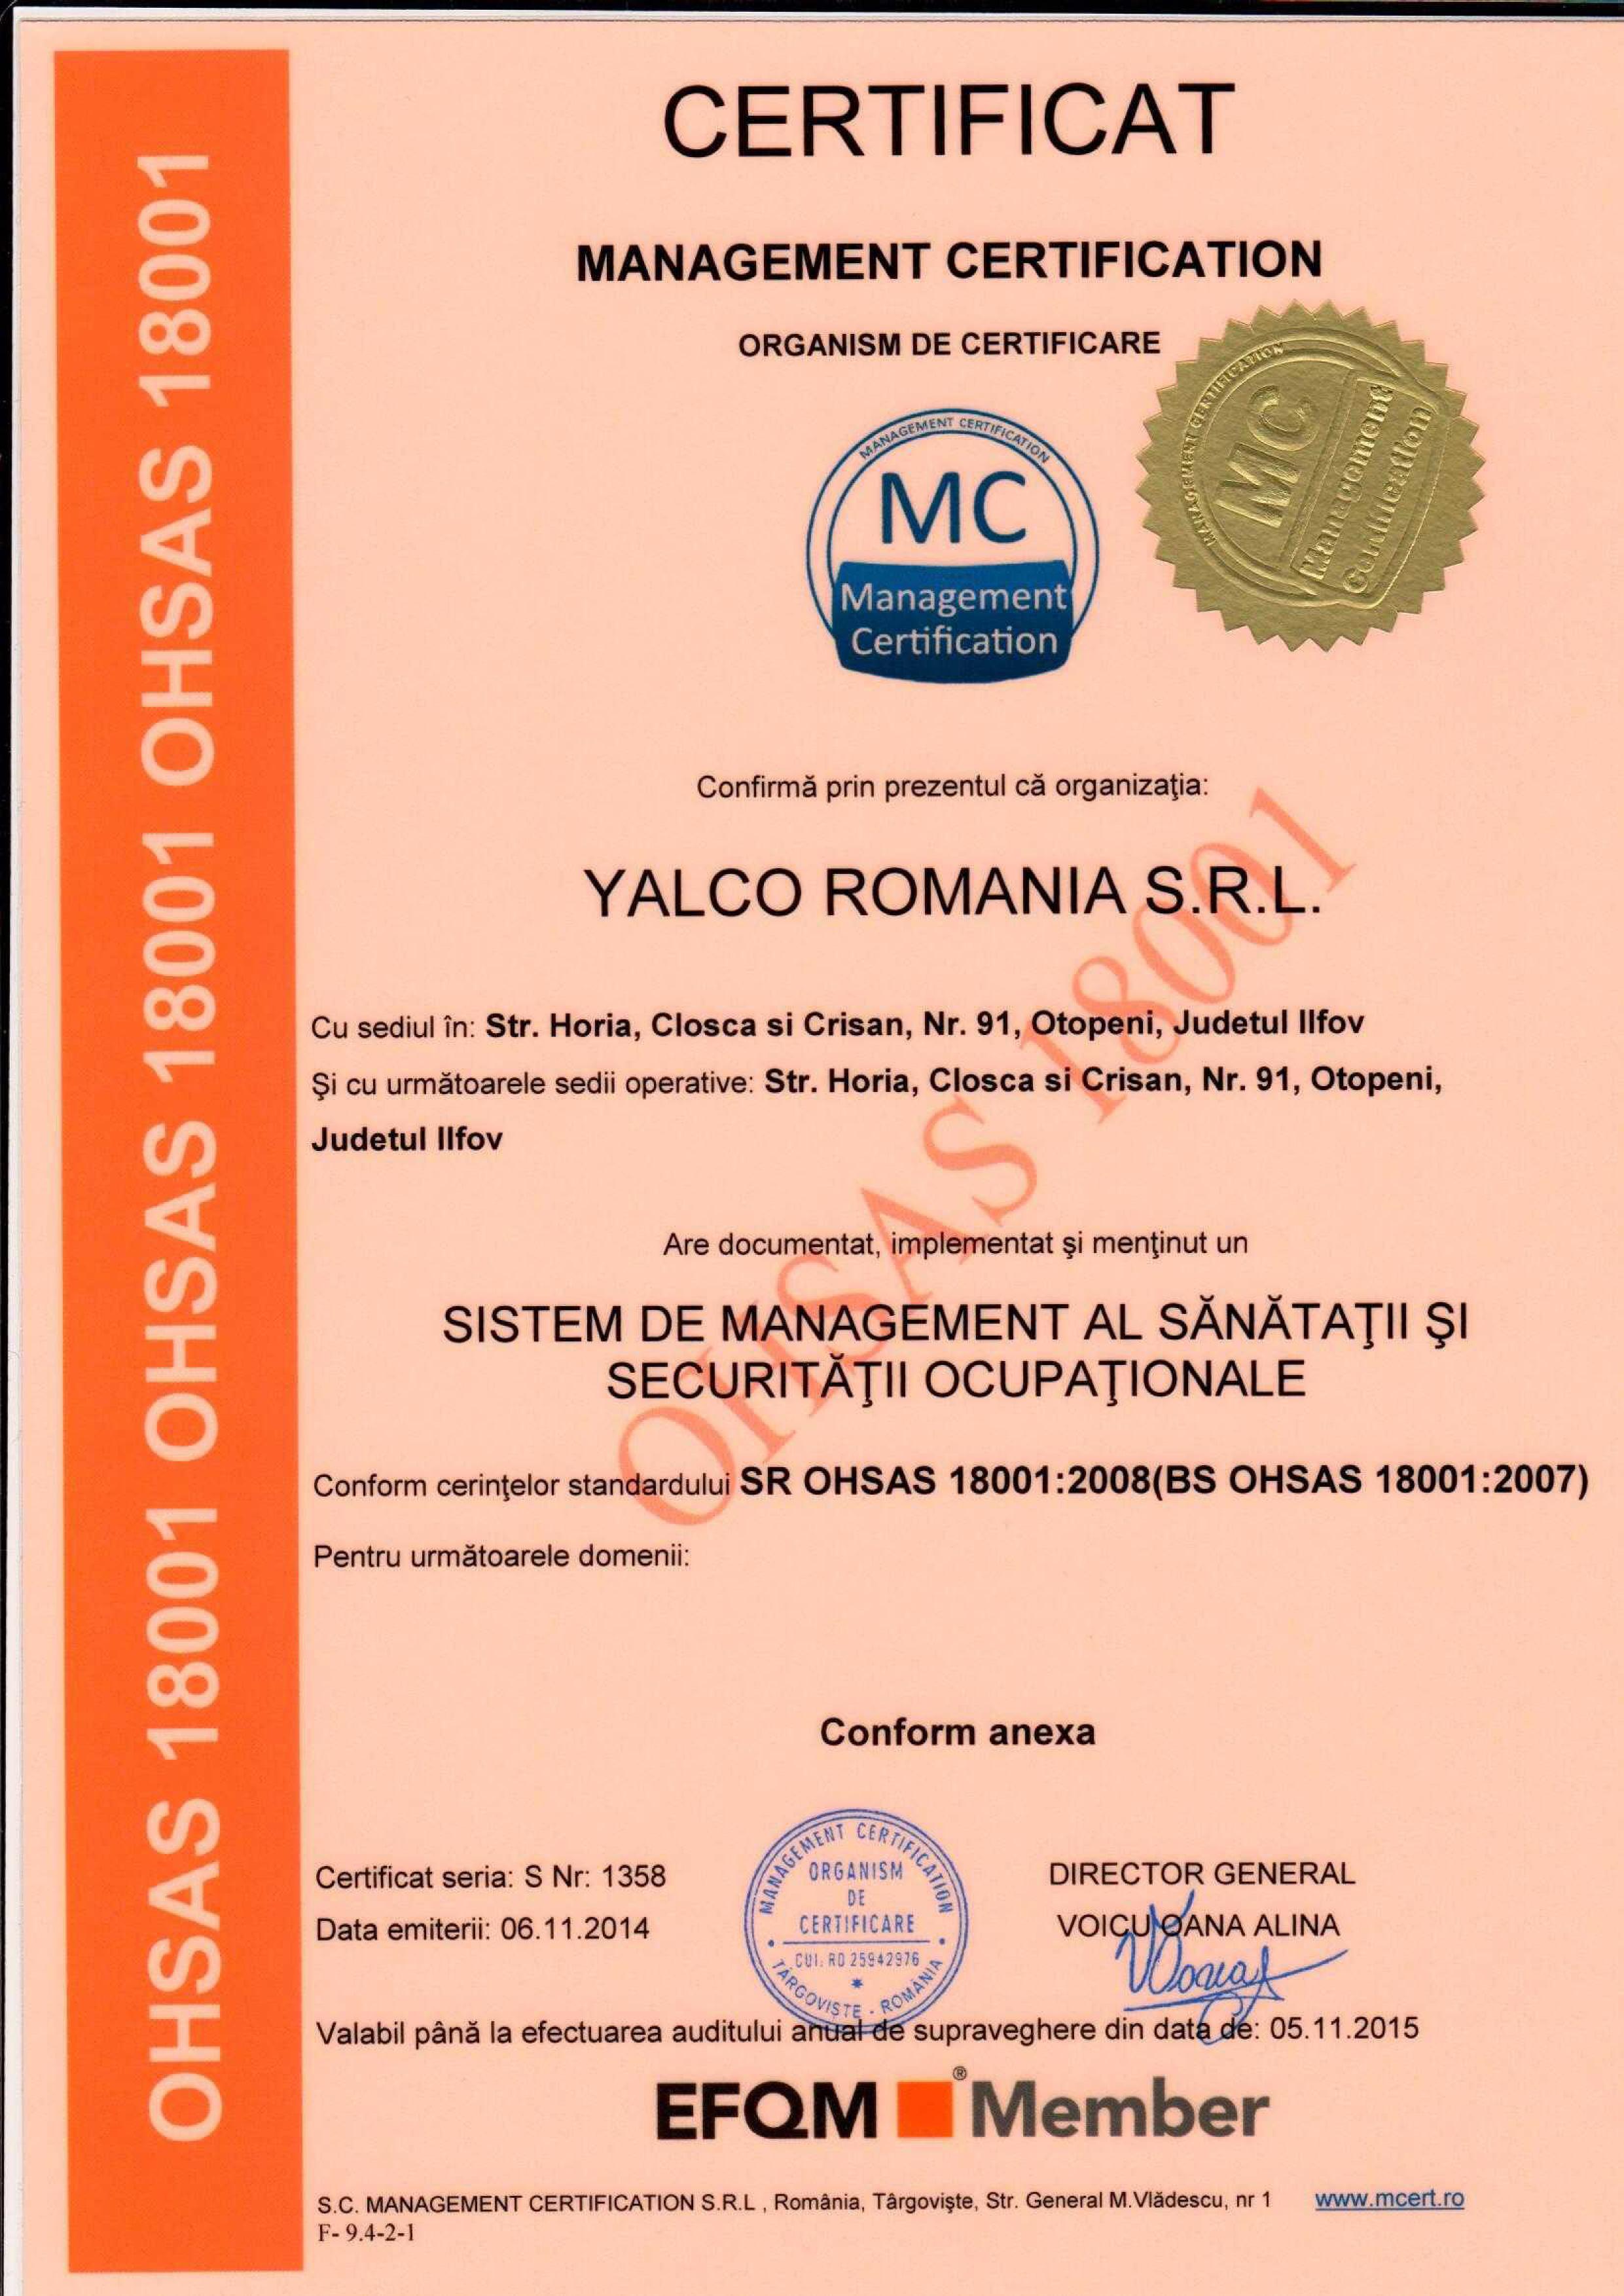 OHSAS - managementul sanatatii si securi